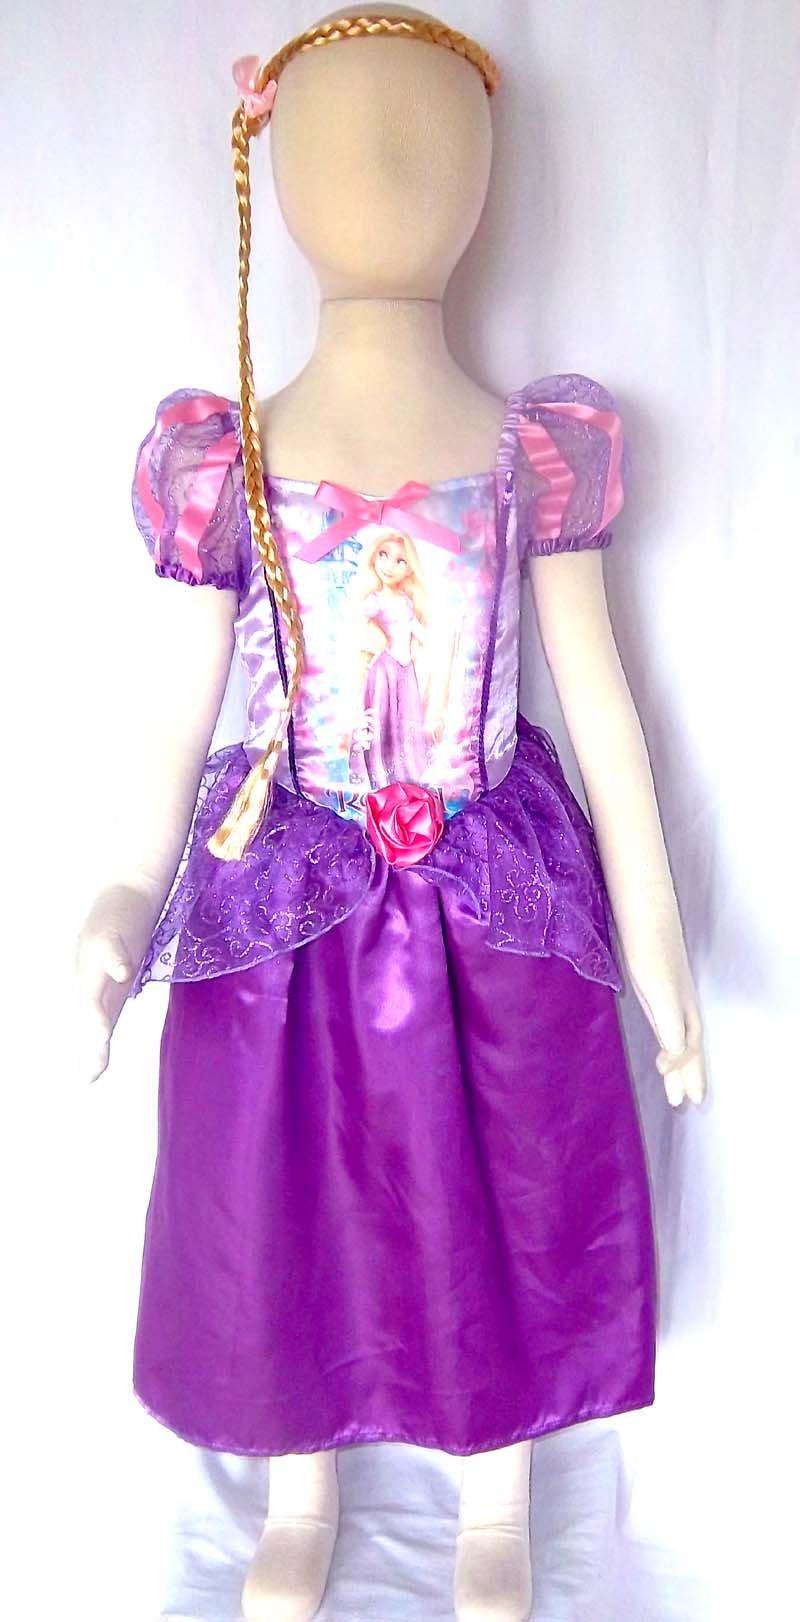 purple rapunzel kids fancy dress princess costume fancy dress up pink Kids Costume holliday gift party dress birthday dress up(China (Mainland))